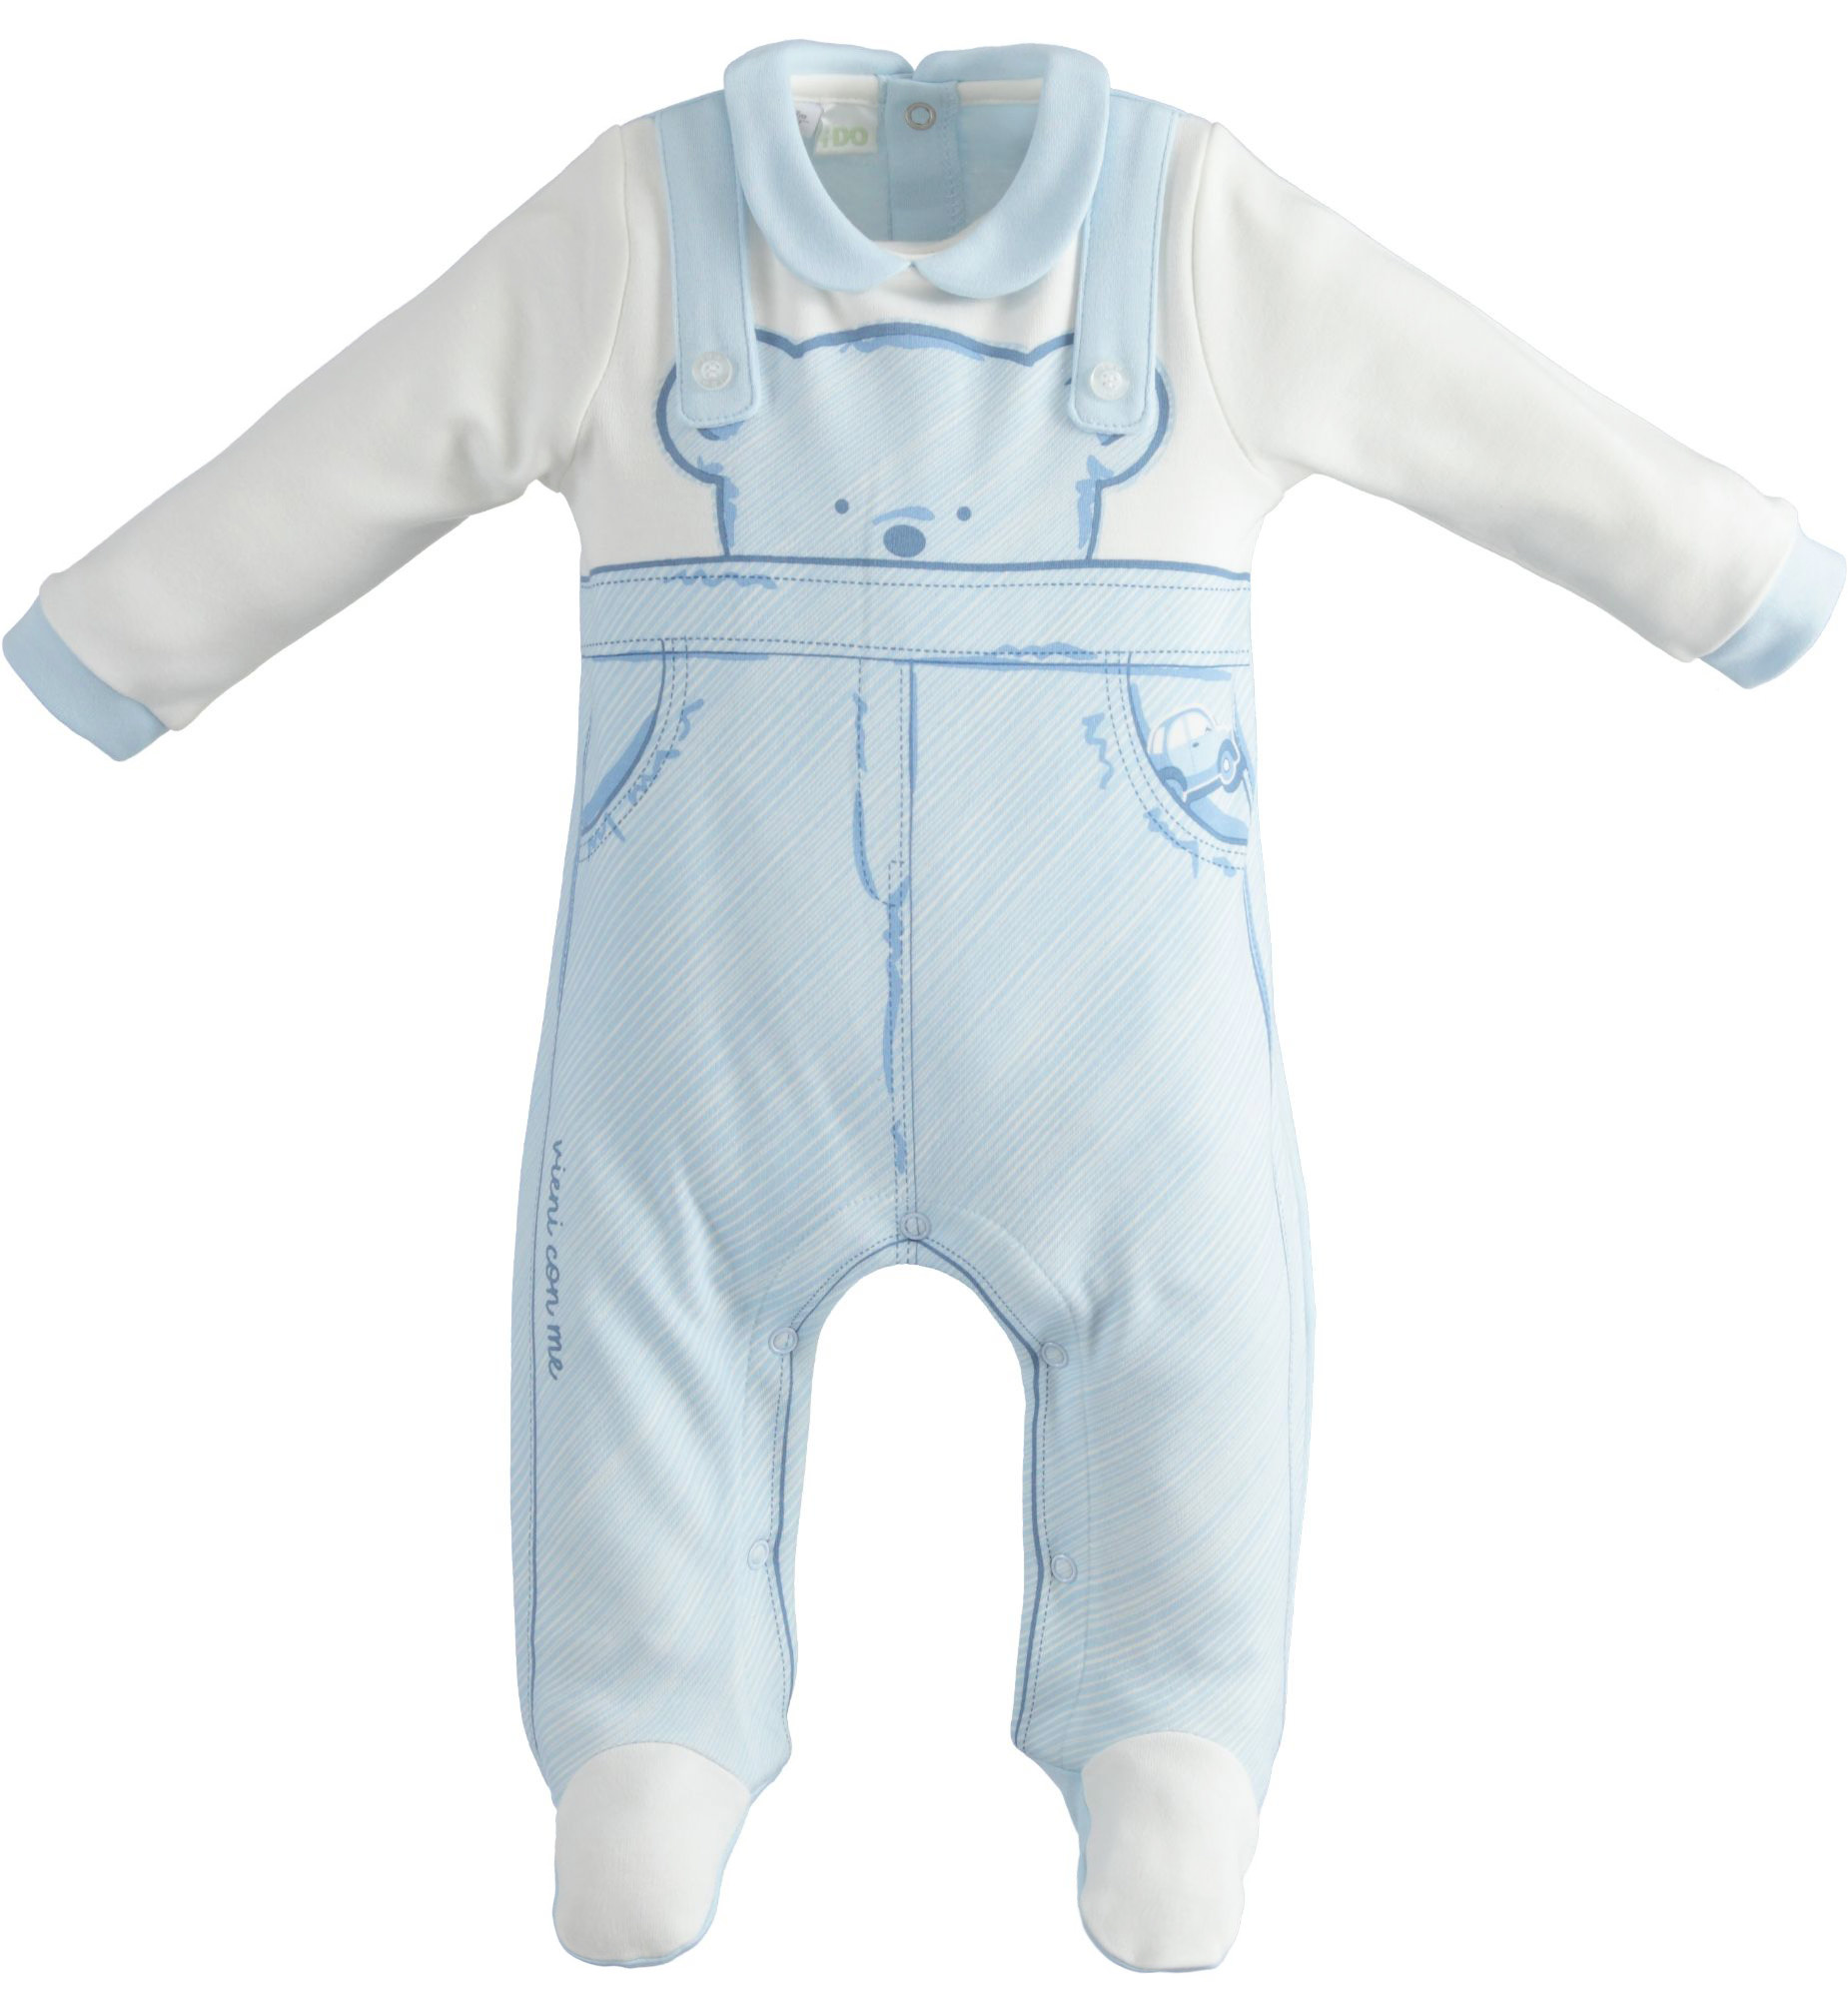 Ido iDO Boys Blue and White Bear Babygrow - 43162